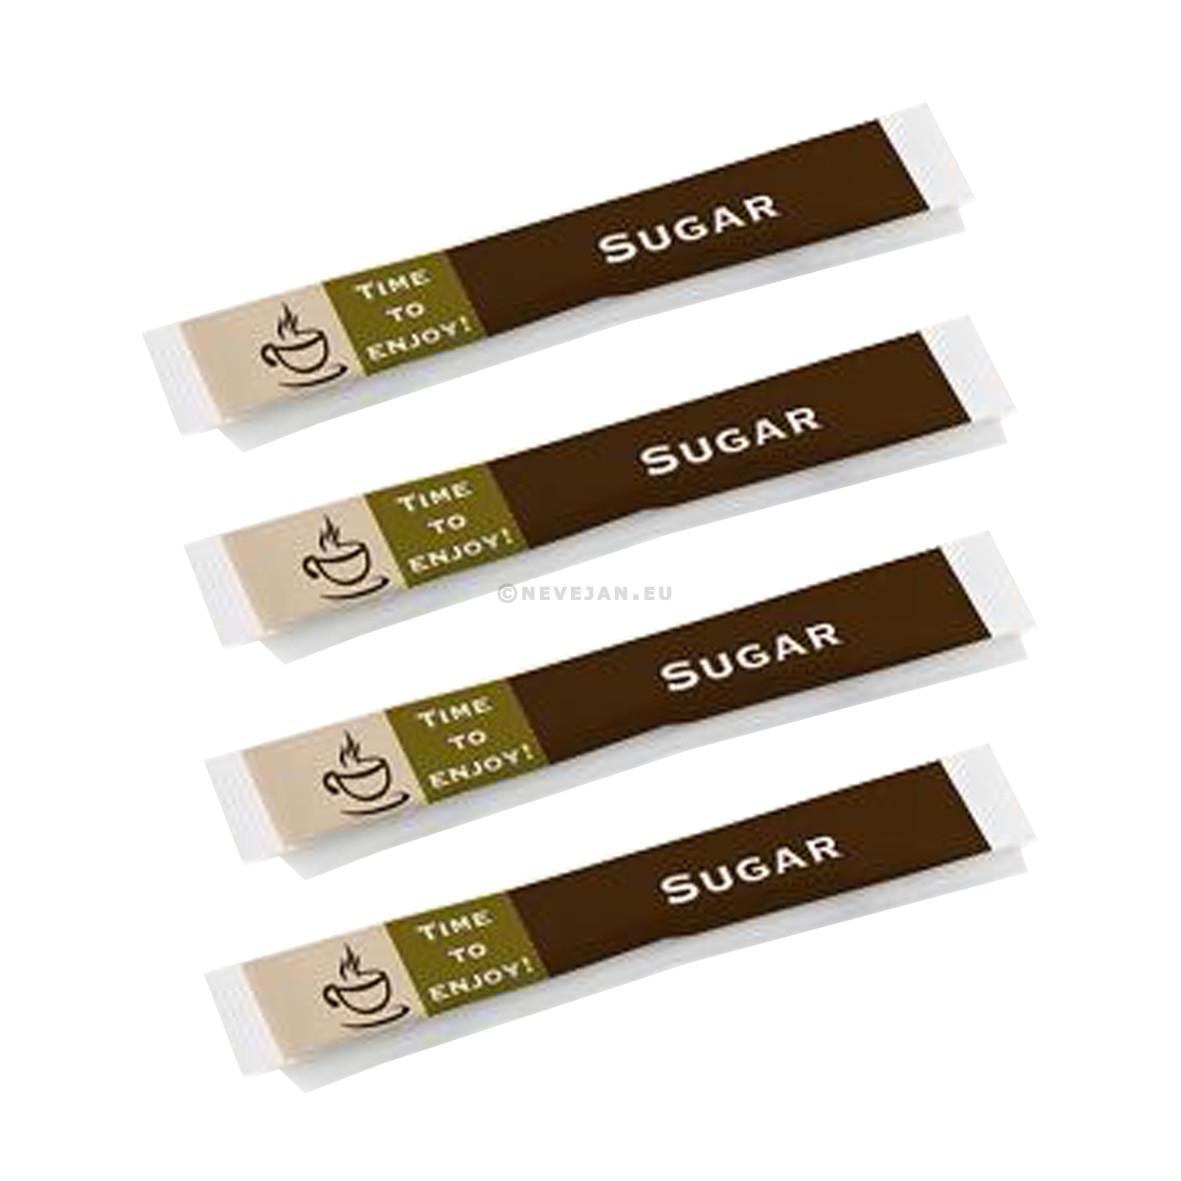 Buchette de sucre 5gr Time To Enjoy